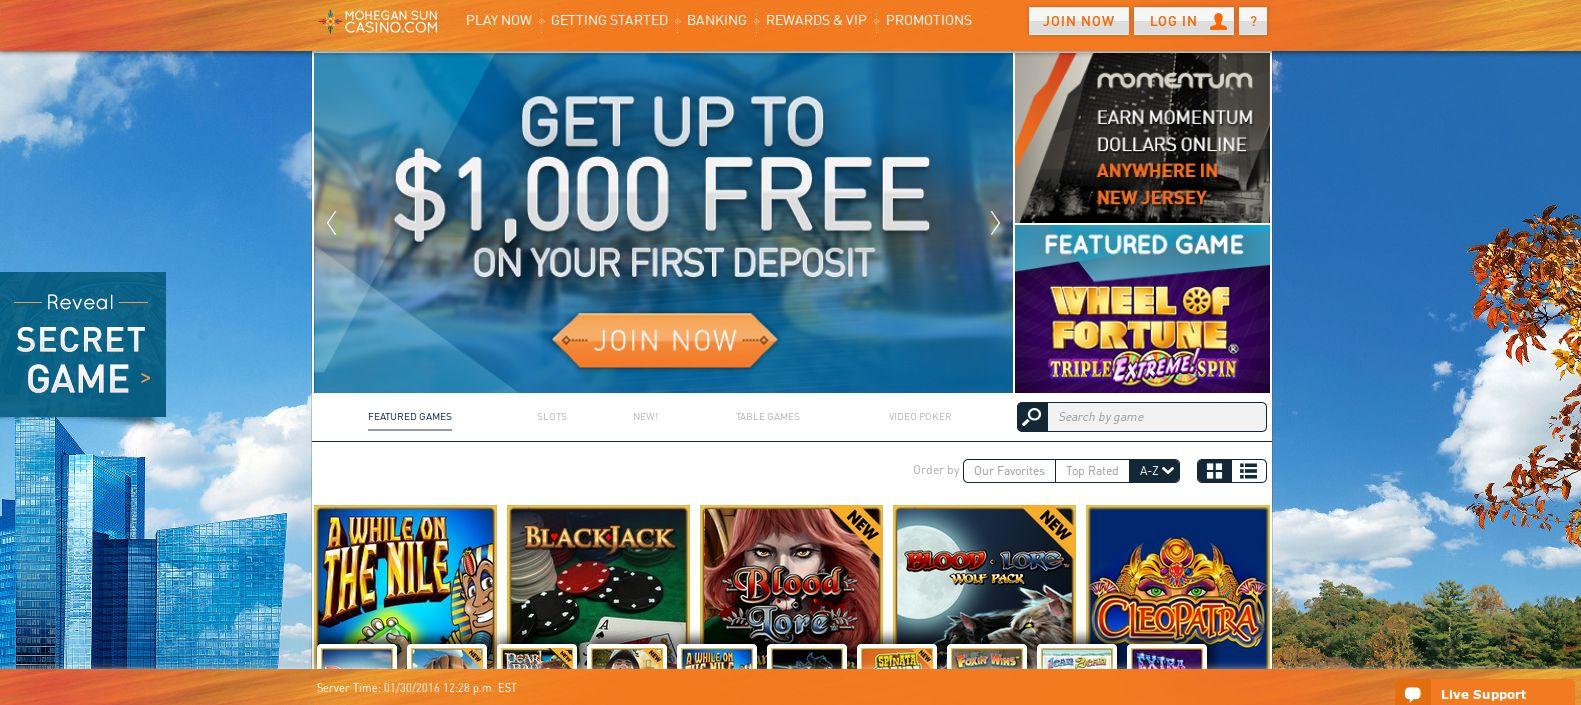 Mohegan sun casino bonus offers